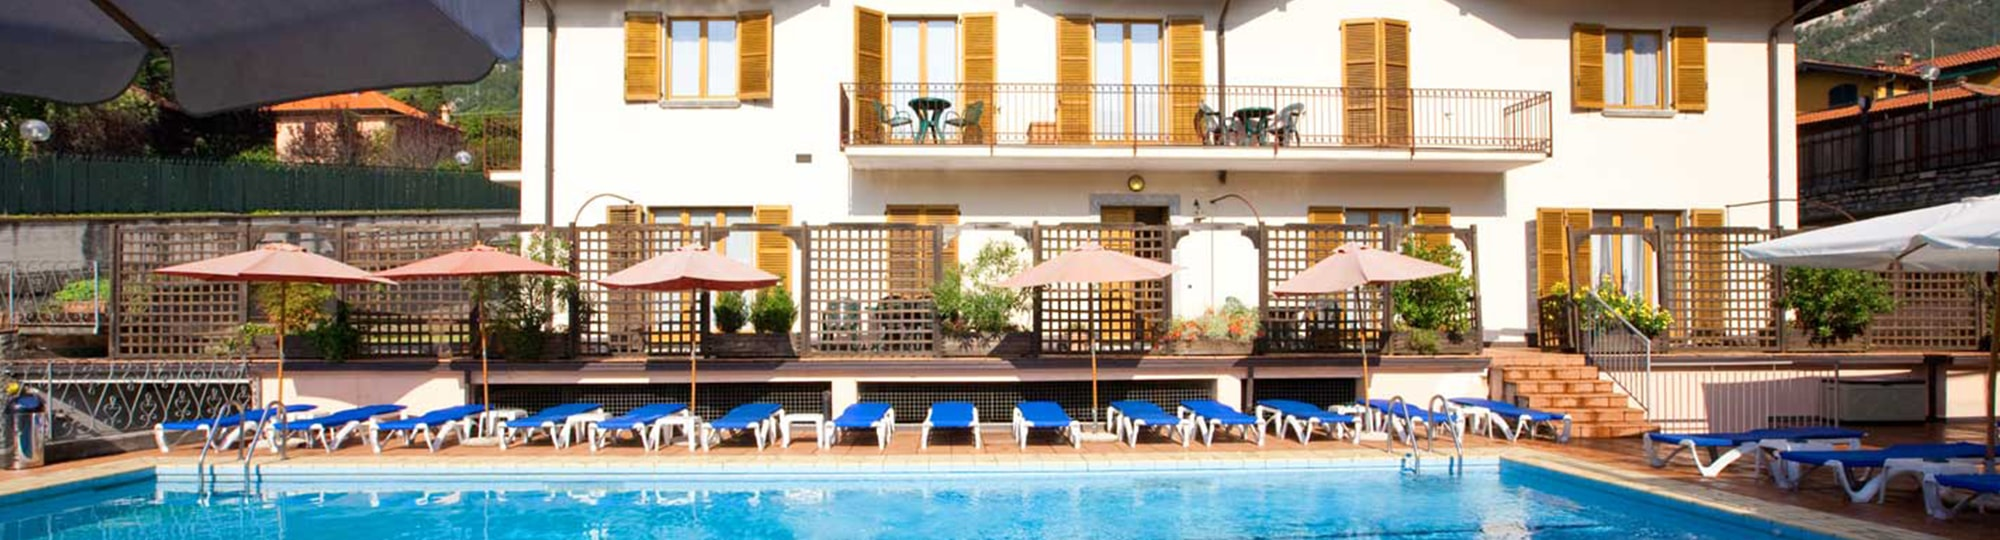 Vue de l'hotel Hotel Albergo Lenno 4* à Lenno